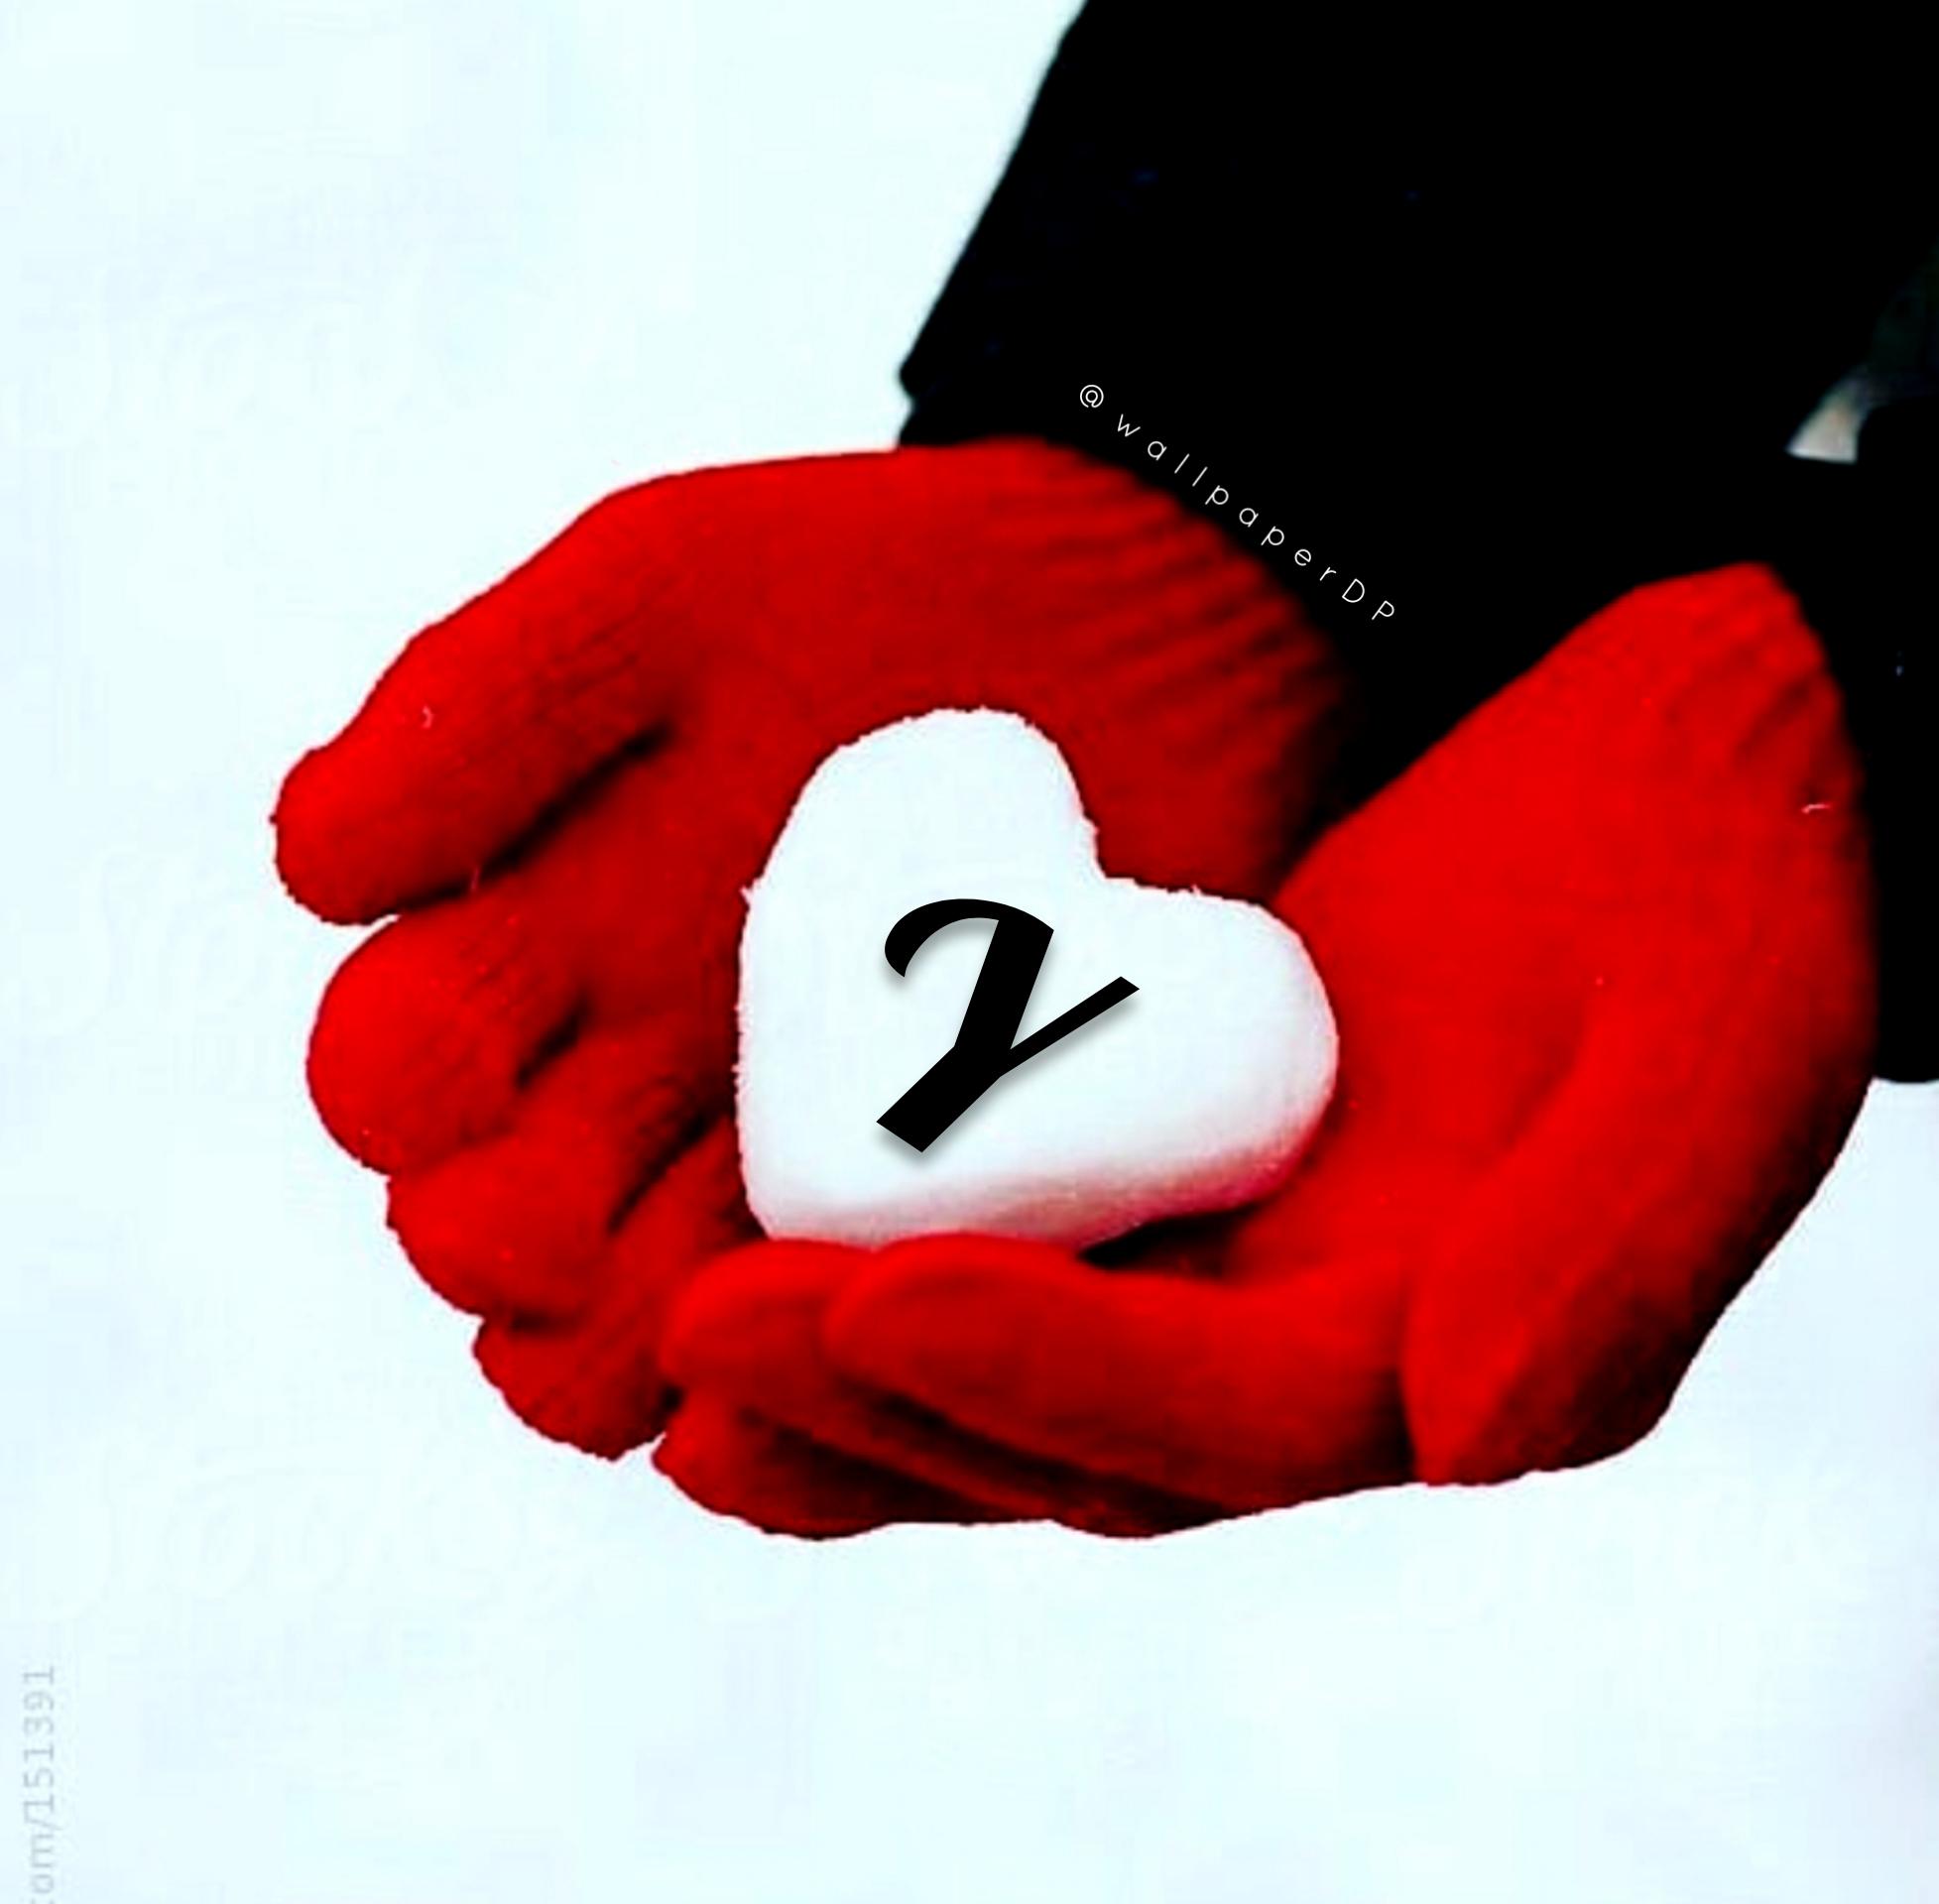 Snow Heart Winter Alphabet Letters Images For Whatsapp Dp Download Wallpaper Dp